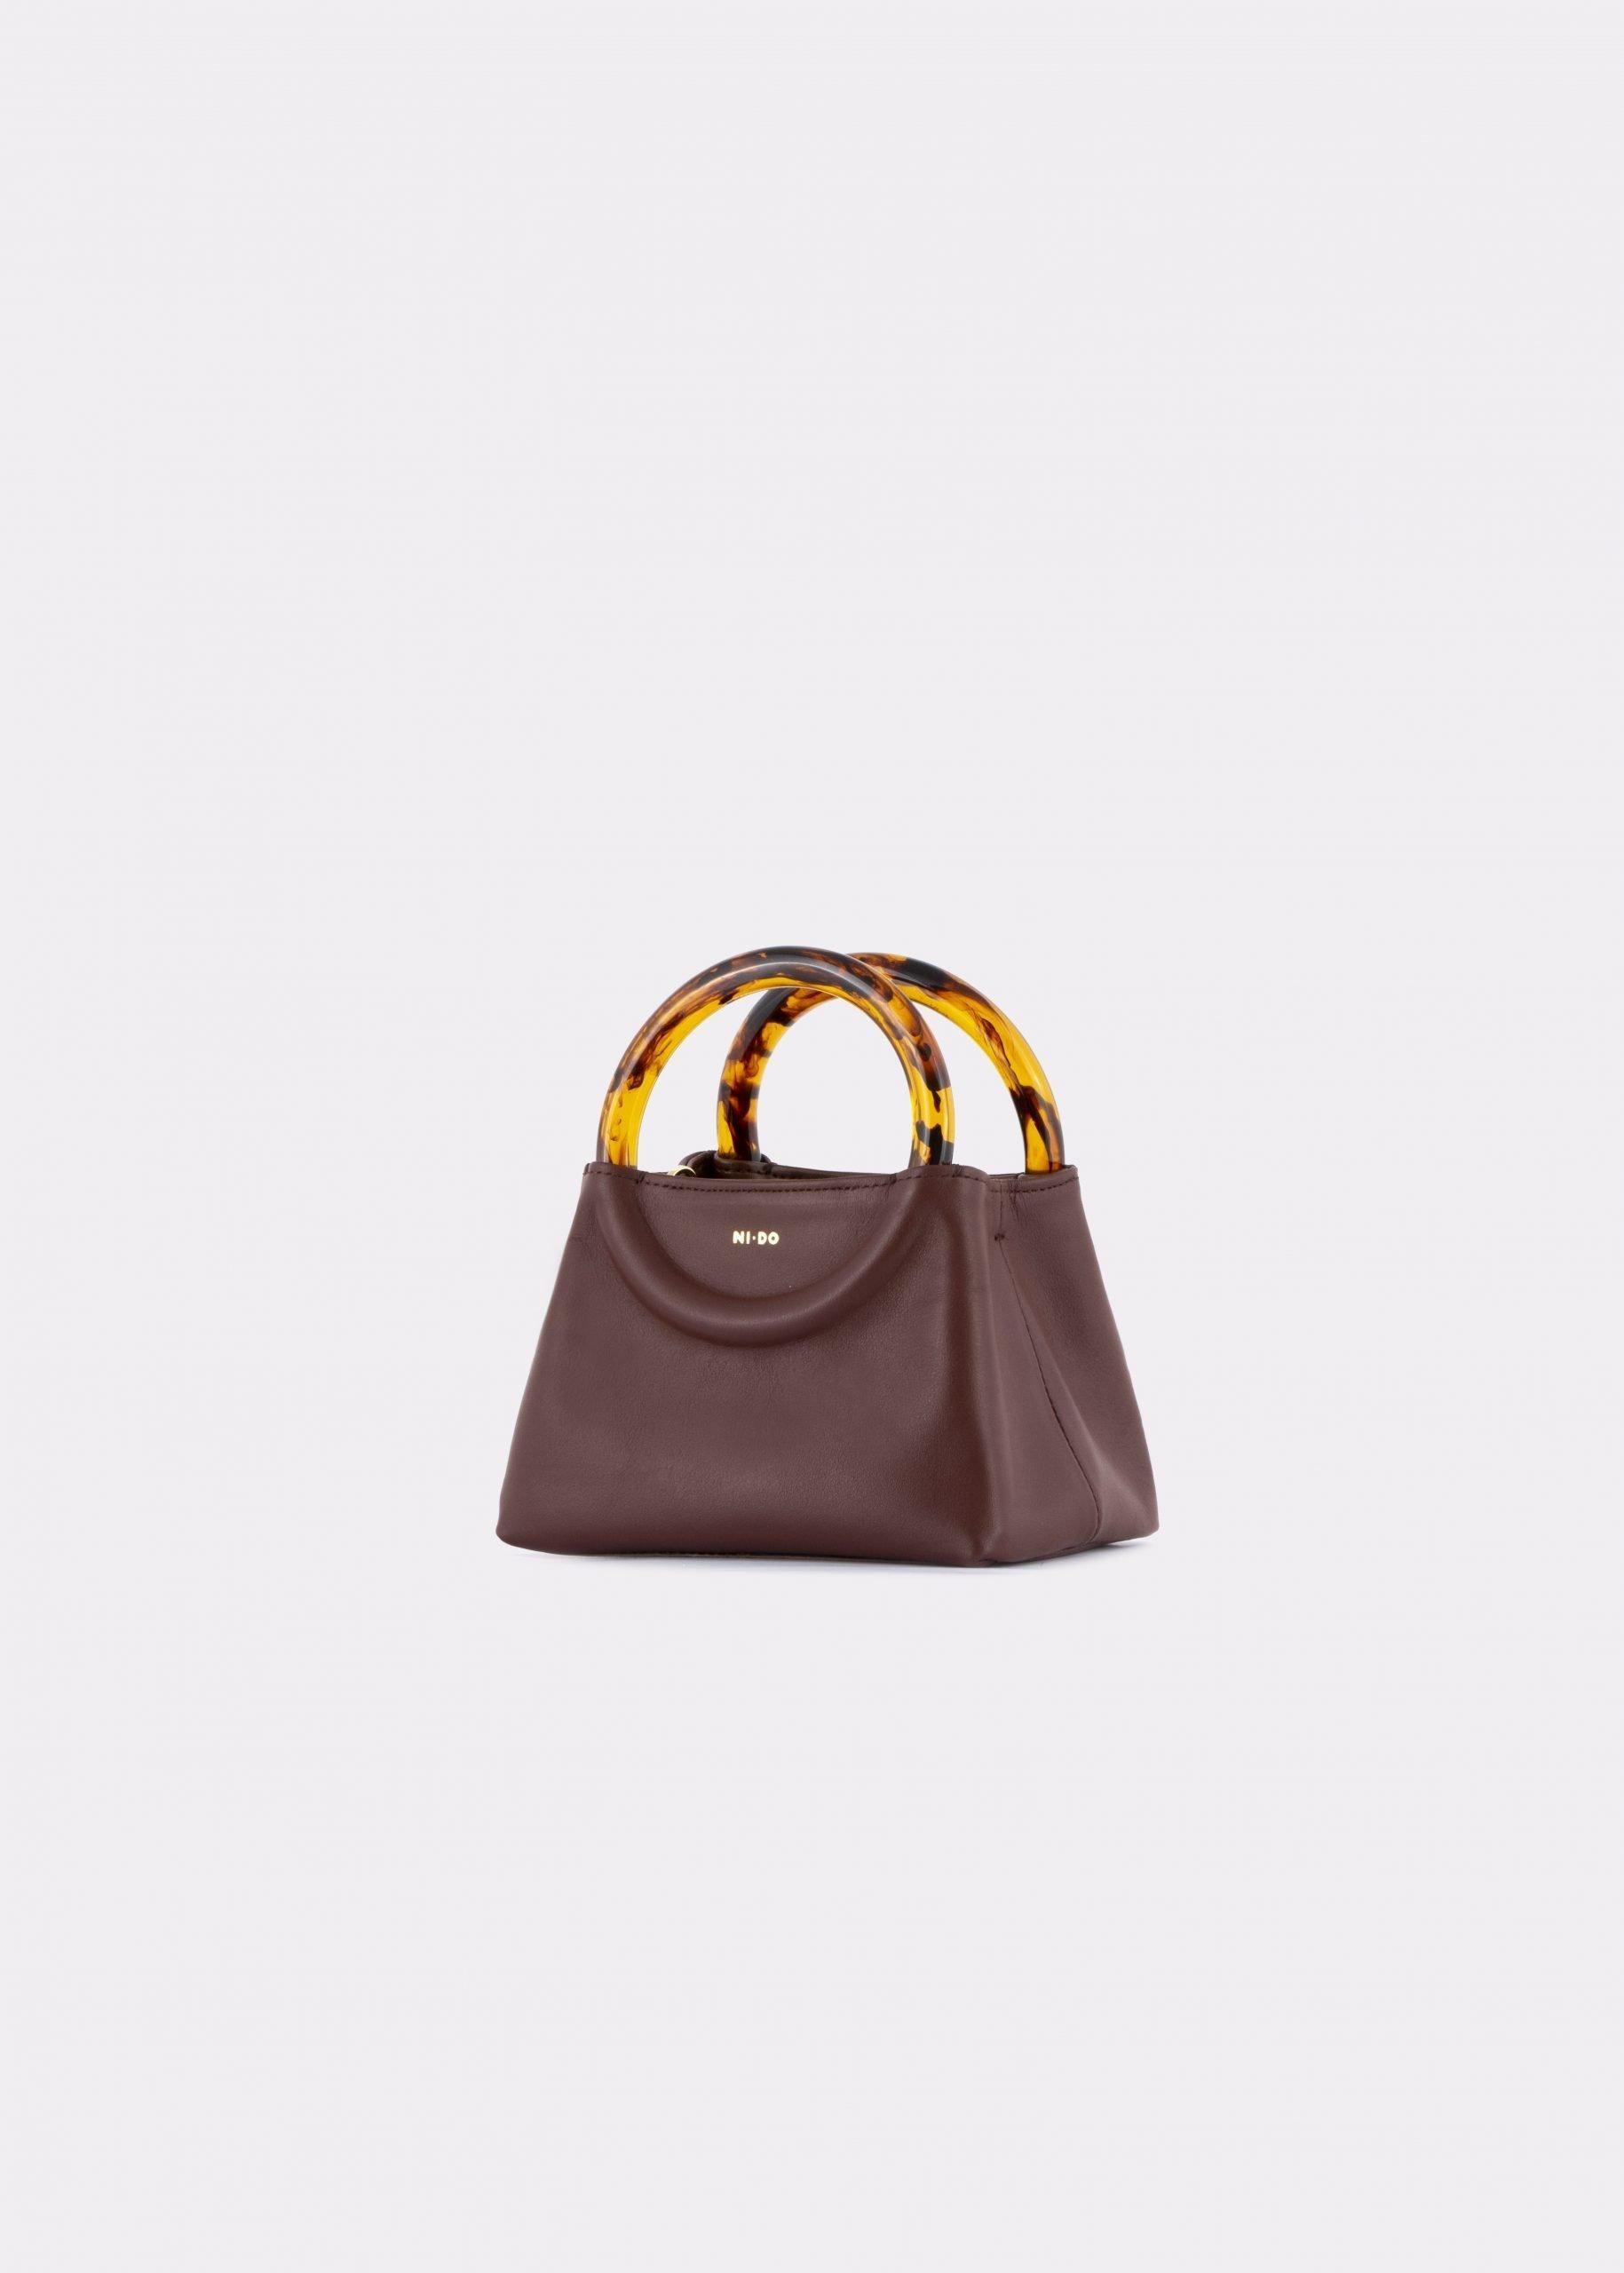 NIDO Bolla Micro bag brown leather Amber_side view